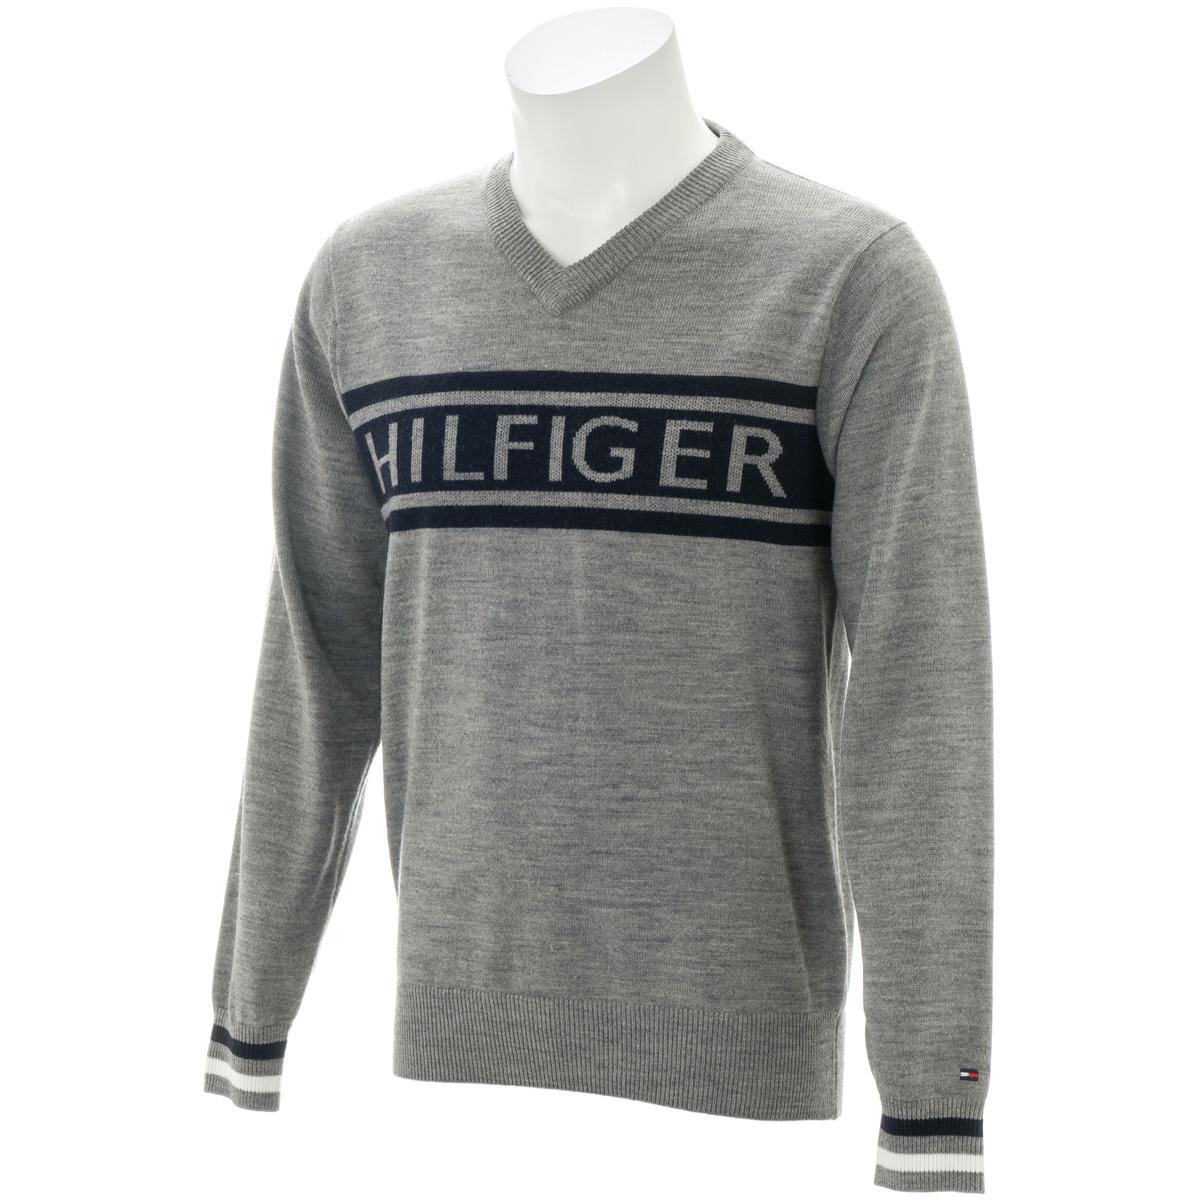 HILFIGER Vネックセーター